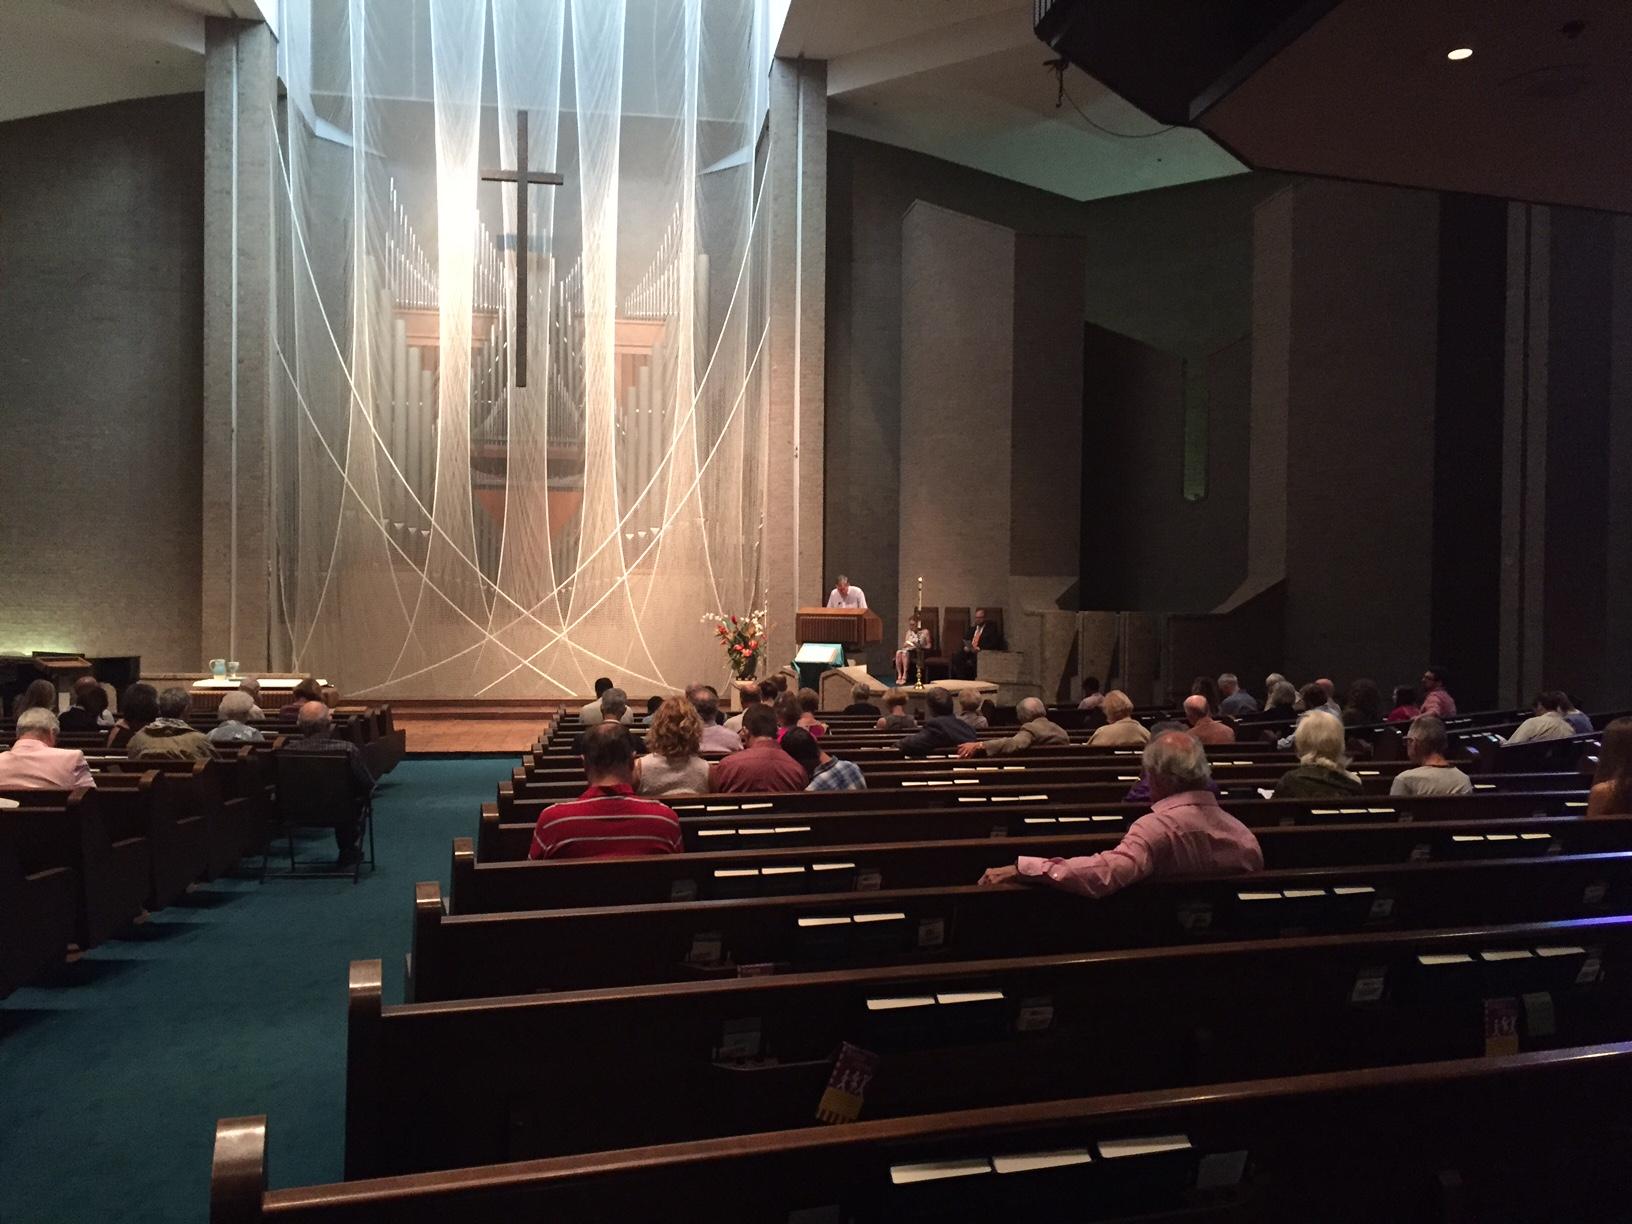 First Baptist Church Austin_307491